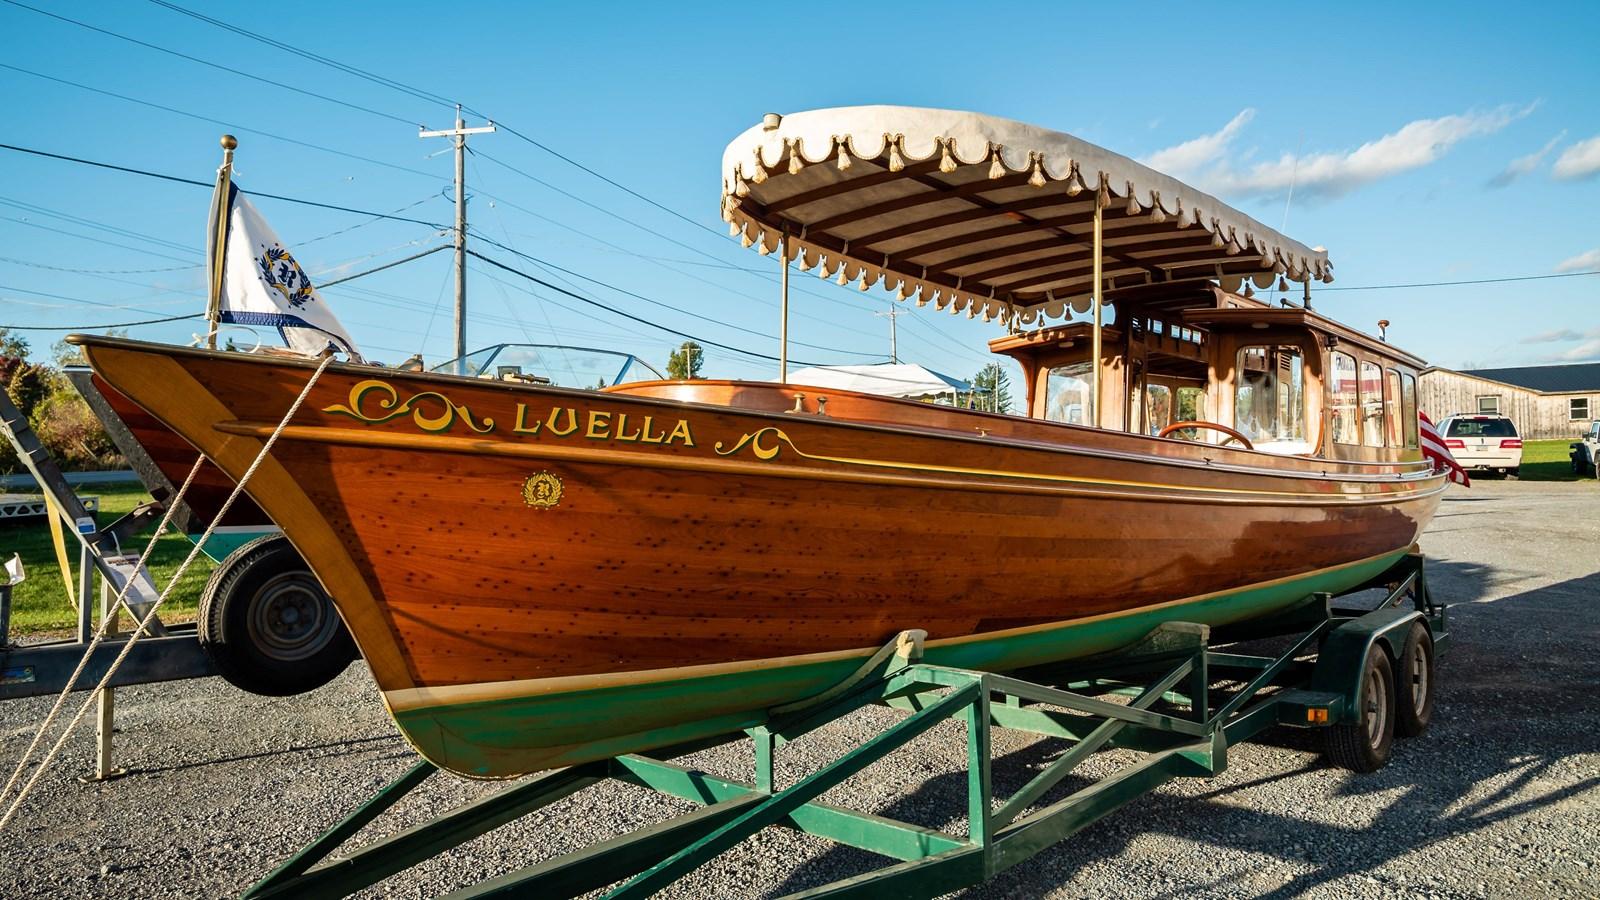 Luella yacht for sale